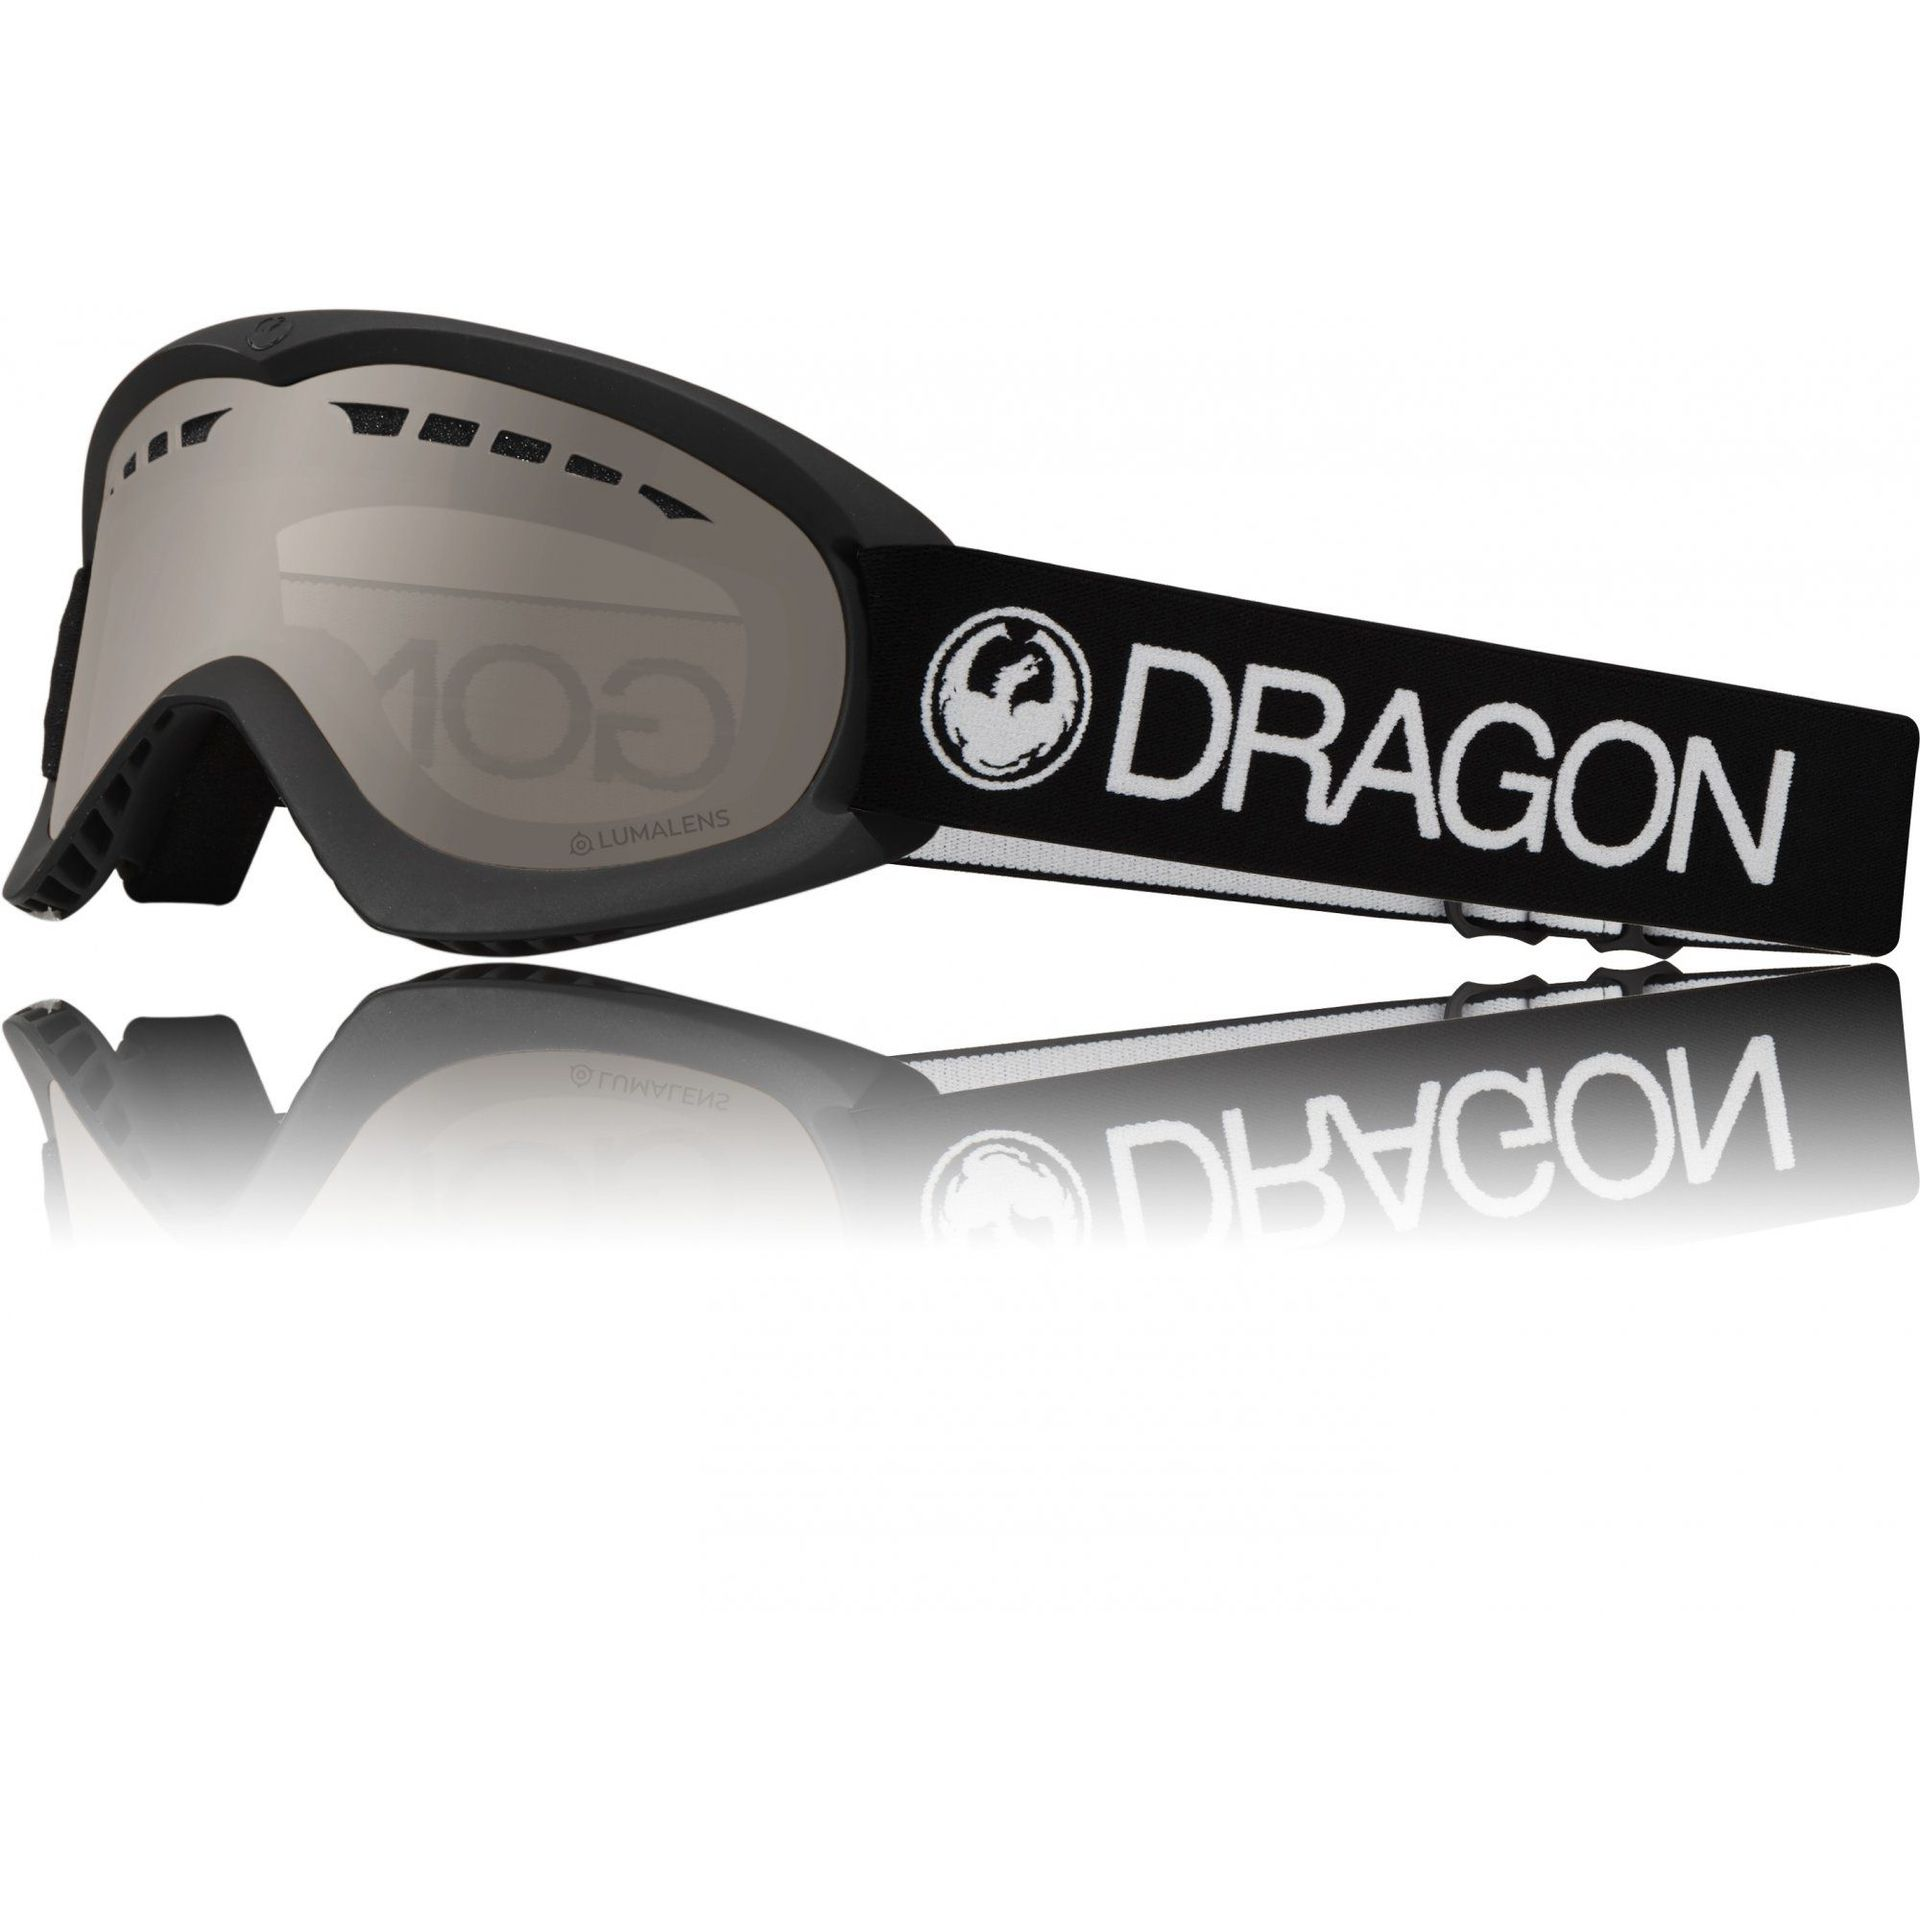 GOGLE DRAGON DX BLACK|SILVER ION